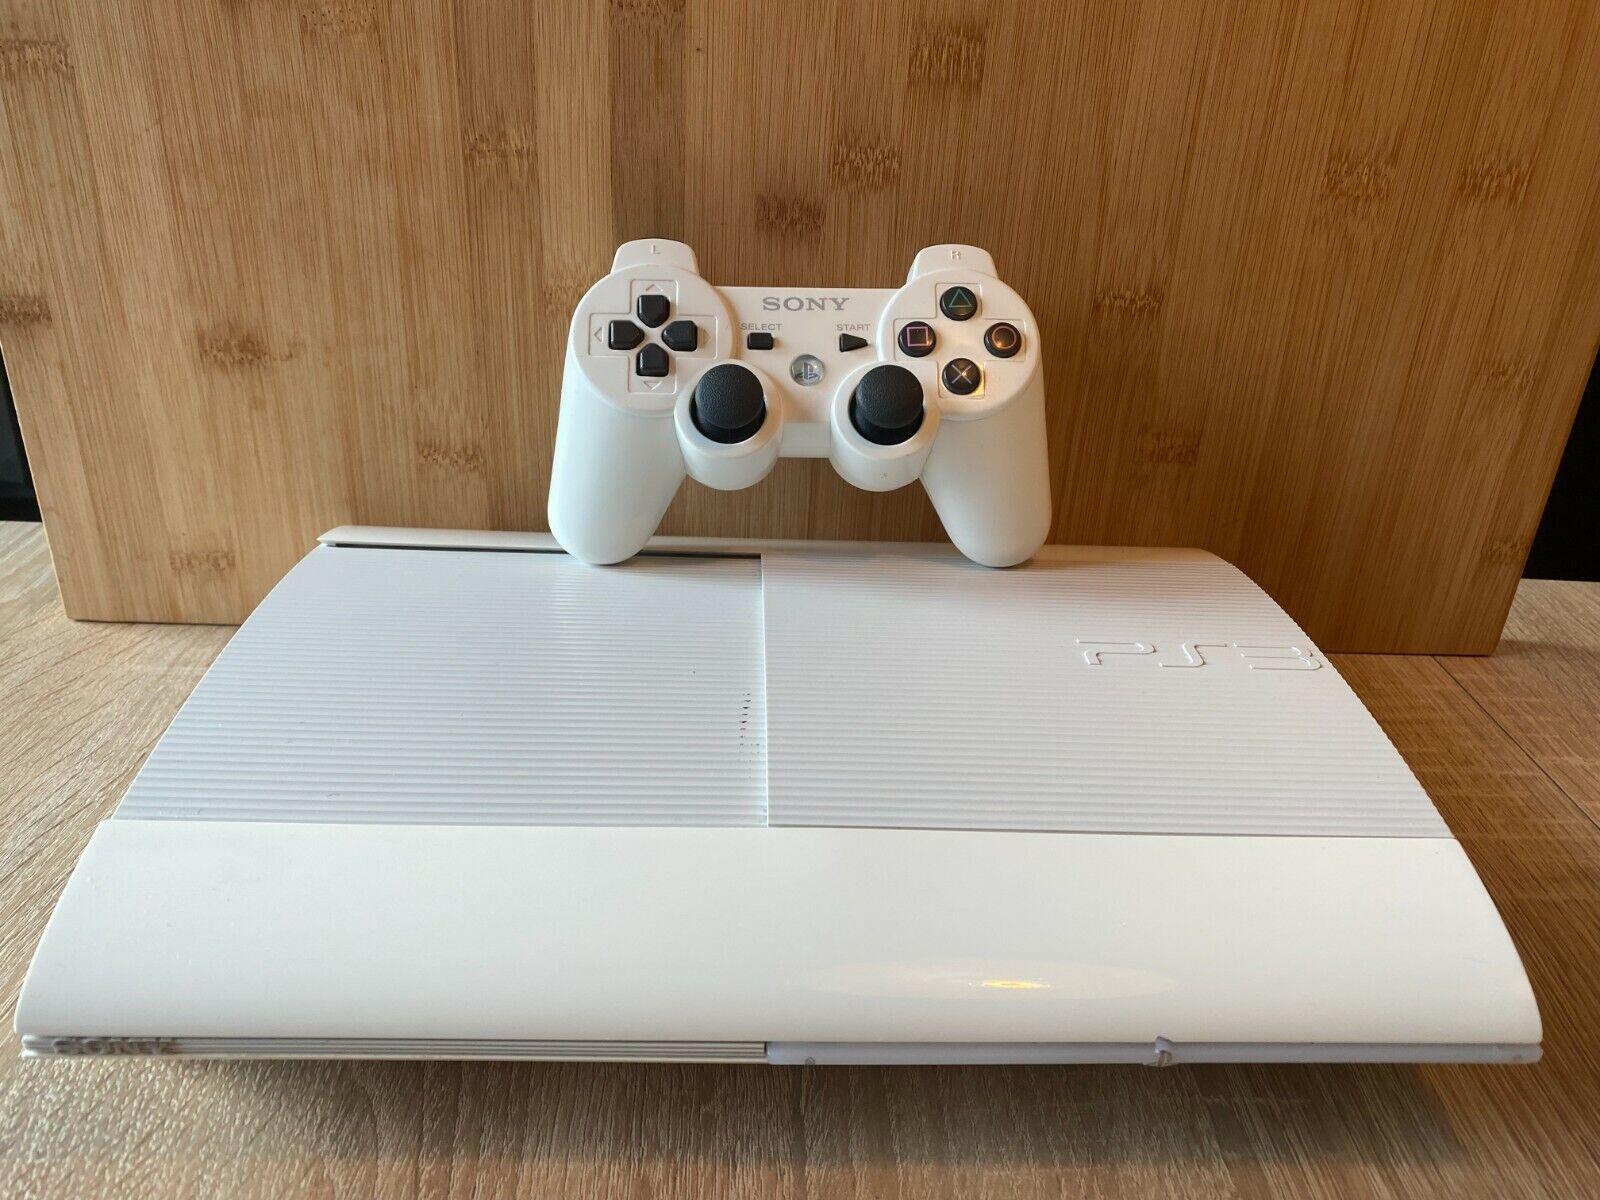 Sony Playstation 3 Super Slim 500 Gb Classic White Spielekonsole Pal Gunstig Kaufen Ebay